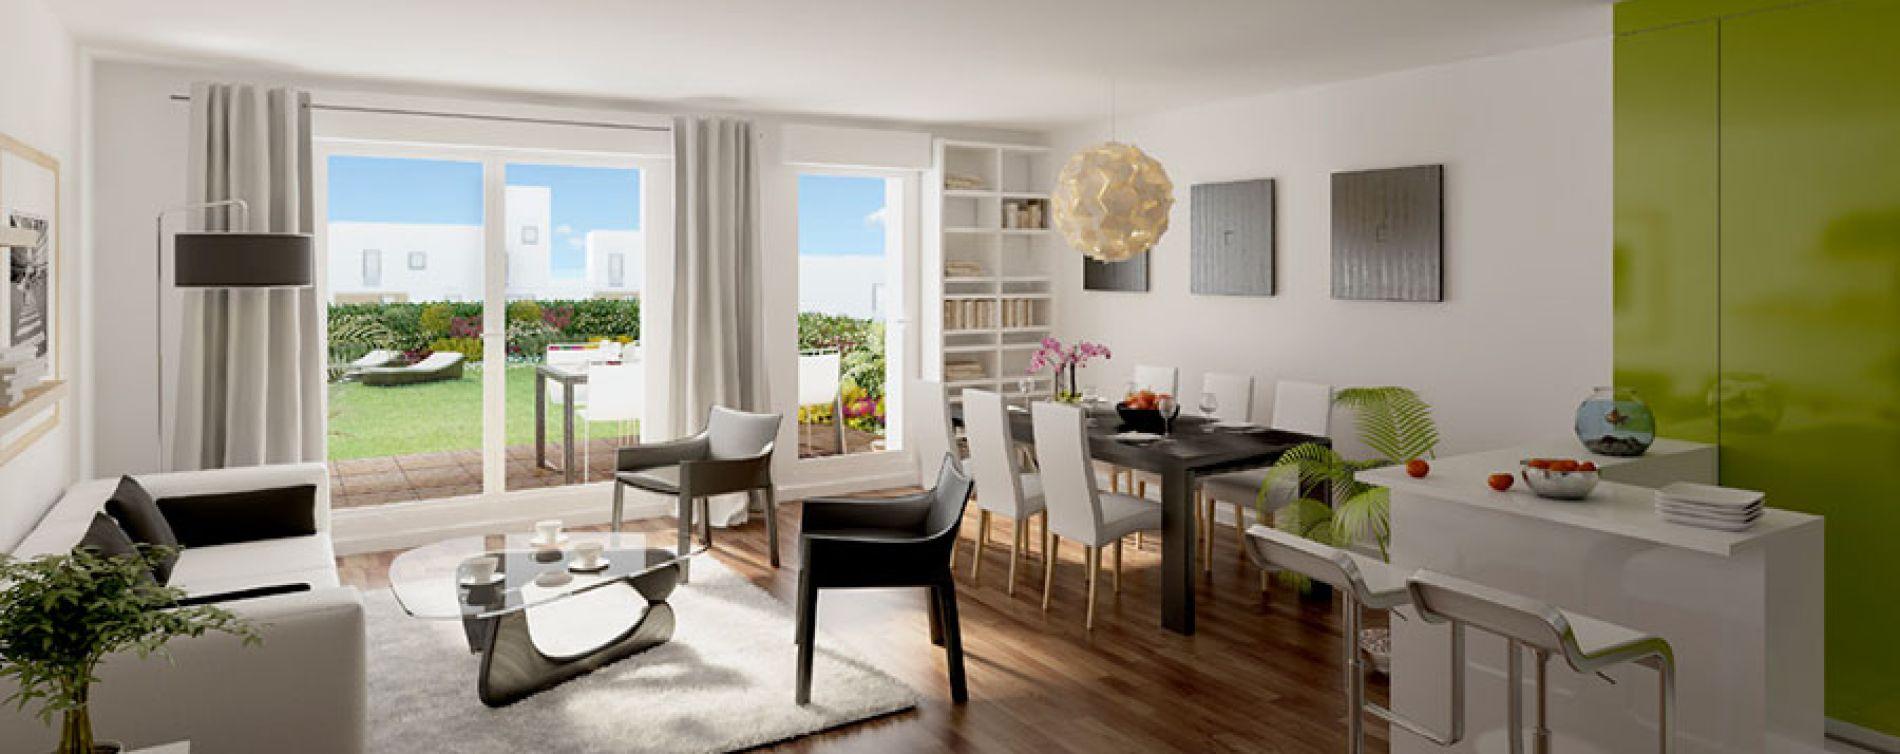 Villepinte : programme immobilier neuve « Orig'In » (3)